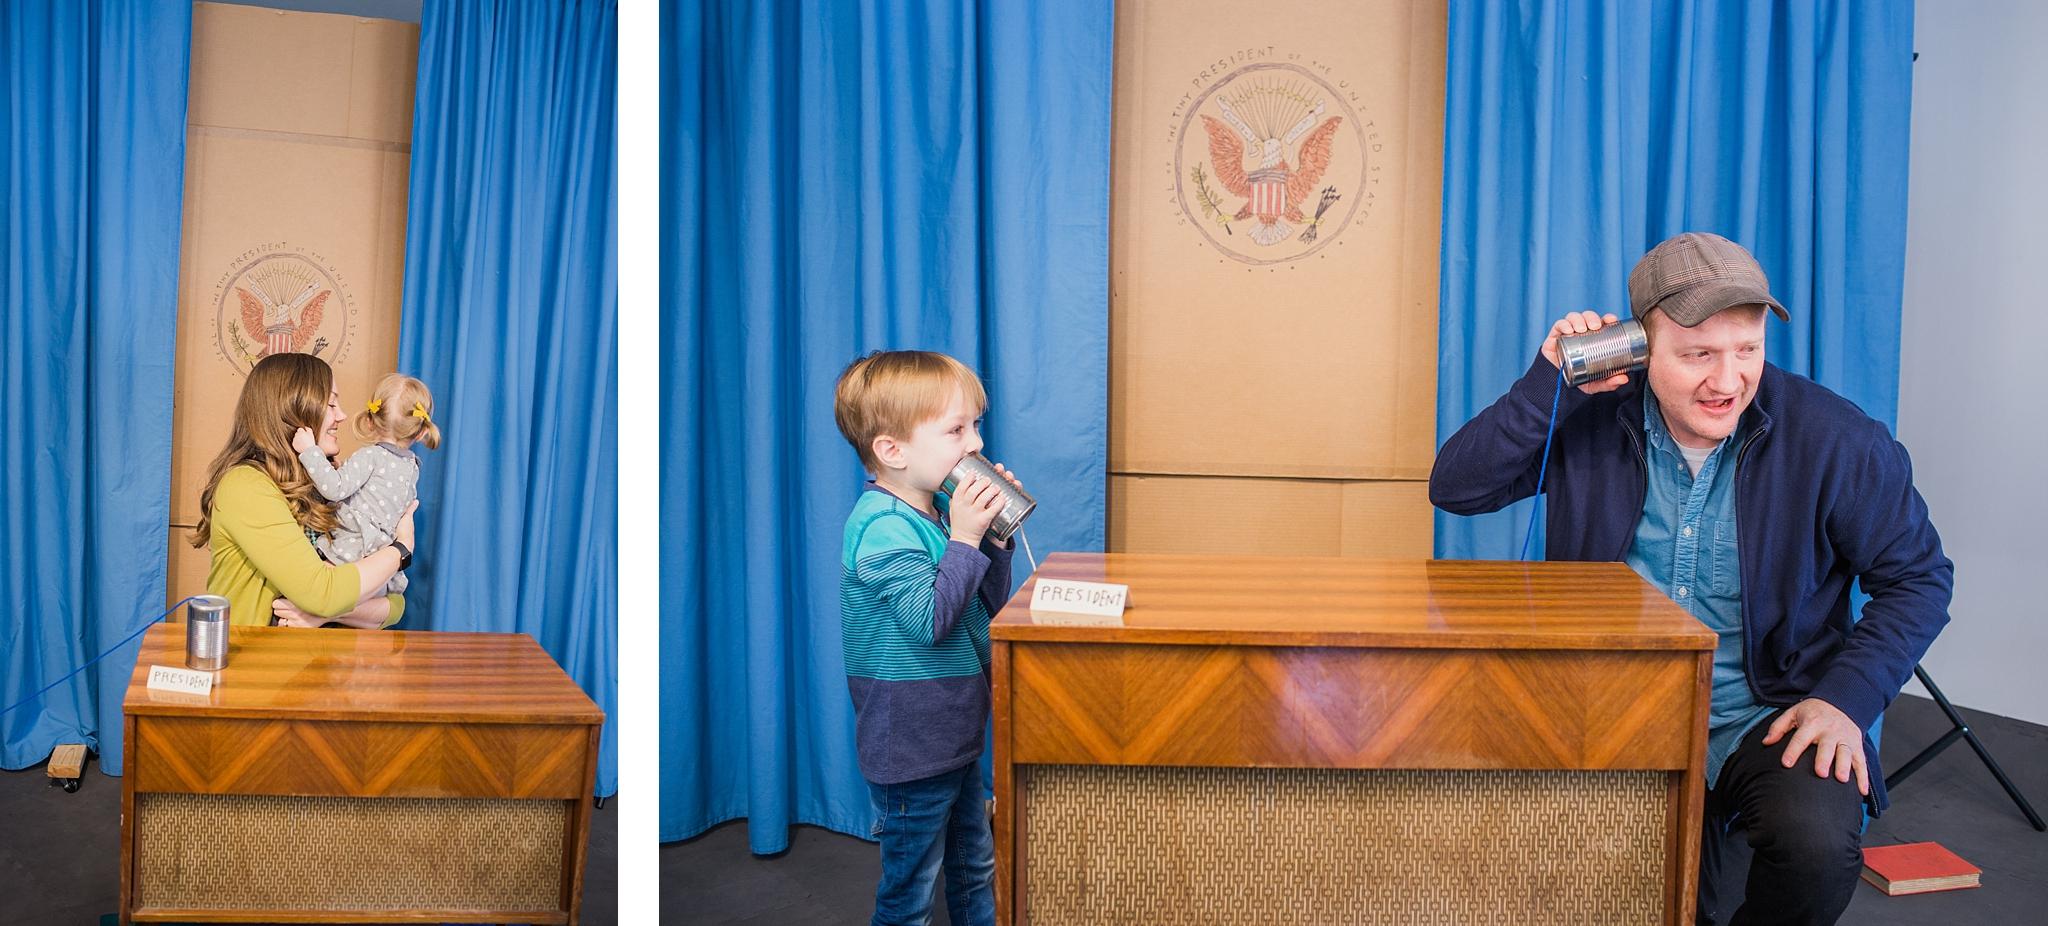 kid-president-creator.jpg